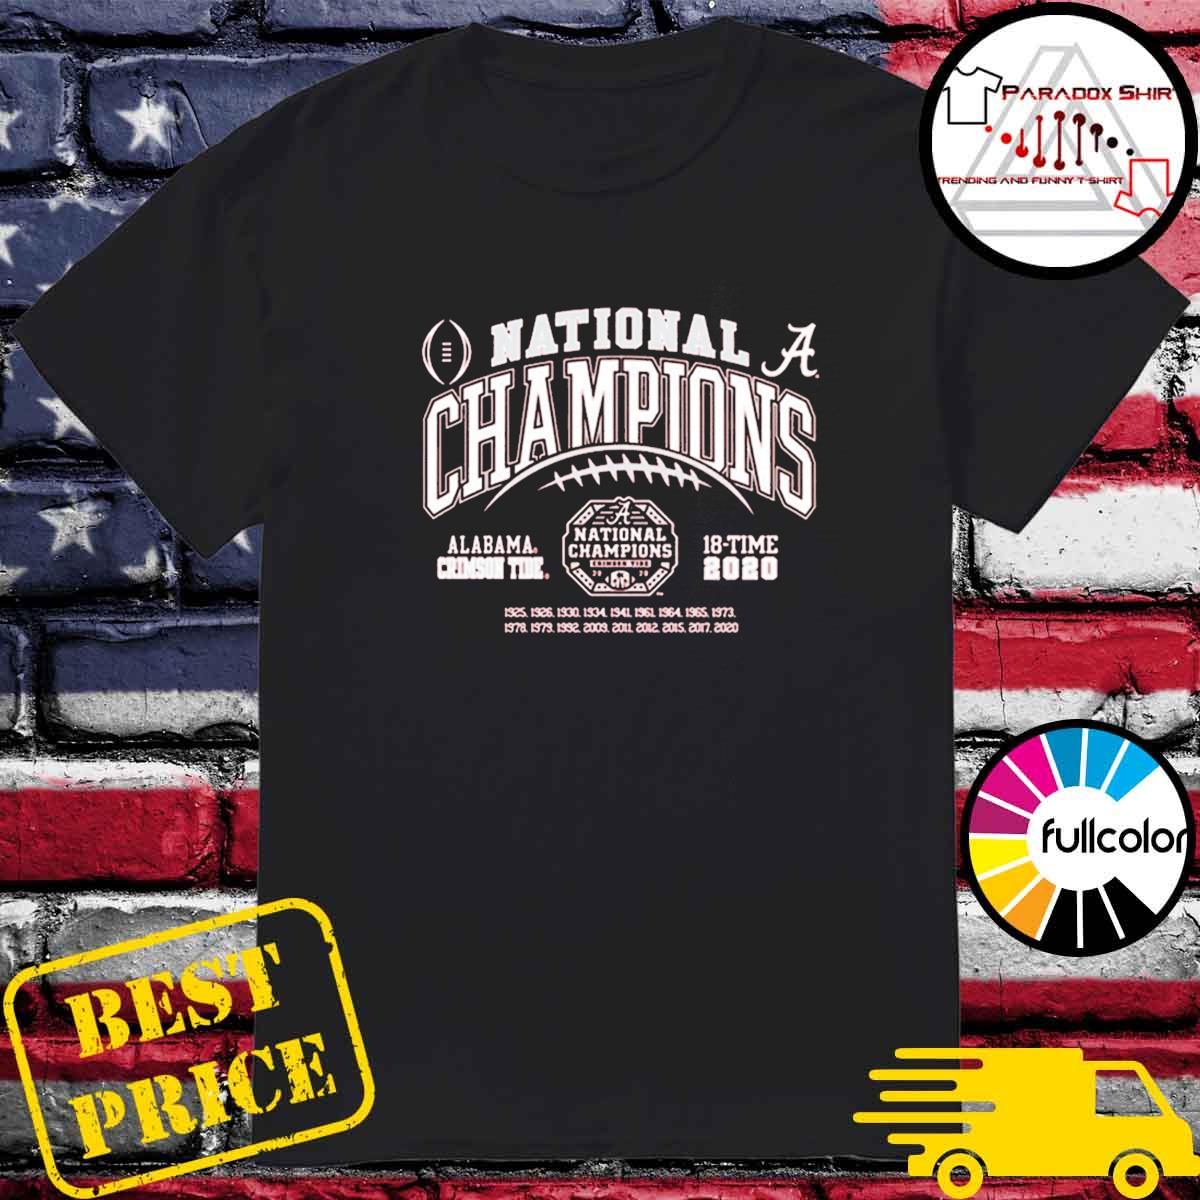 Alabama Crimson Tide National Champs 2020-2021 T-Shirt